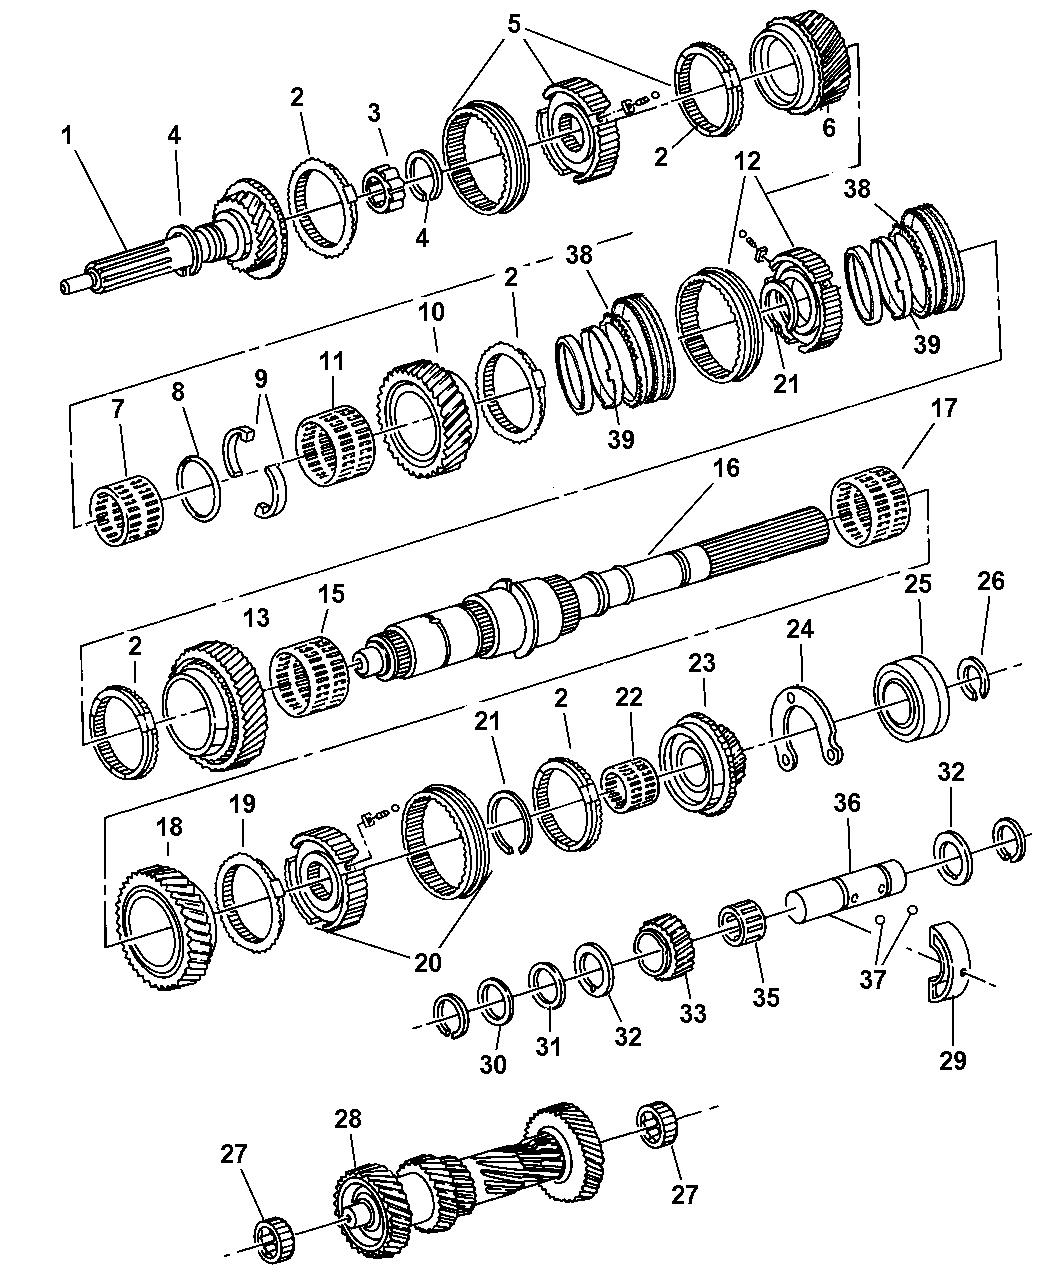 2003 Jeep Wrangler Gear Train Of Manual Transmission Yj Engine Diagram Parts List 1